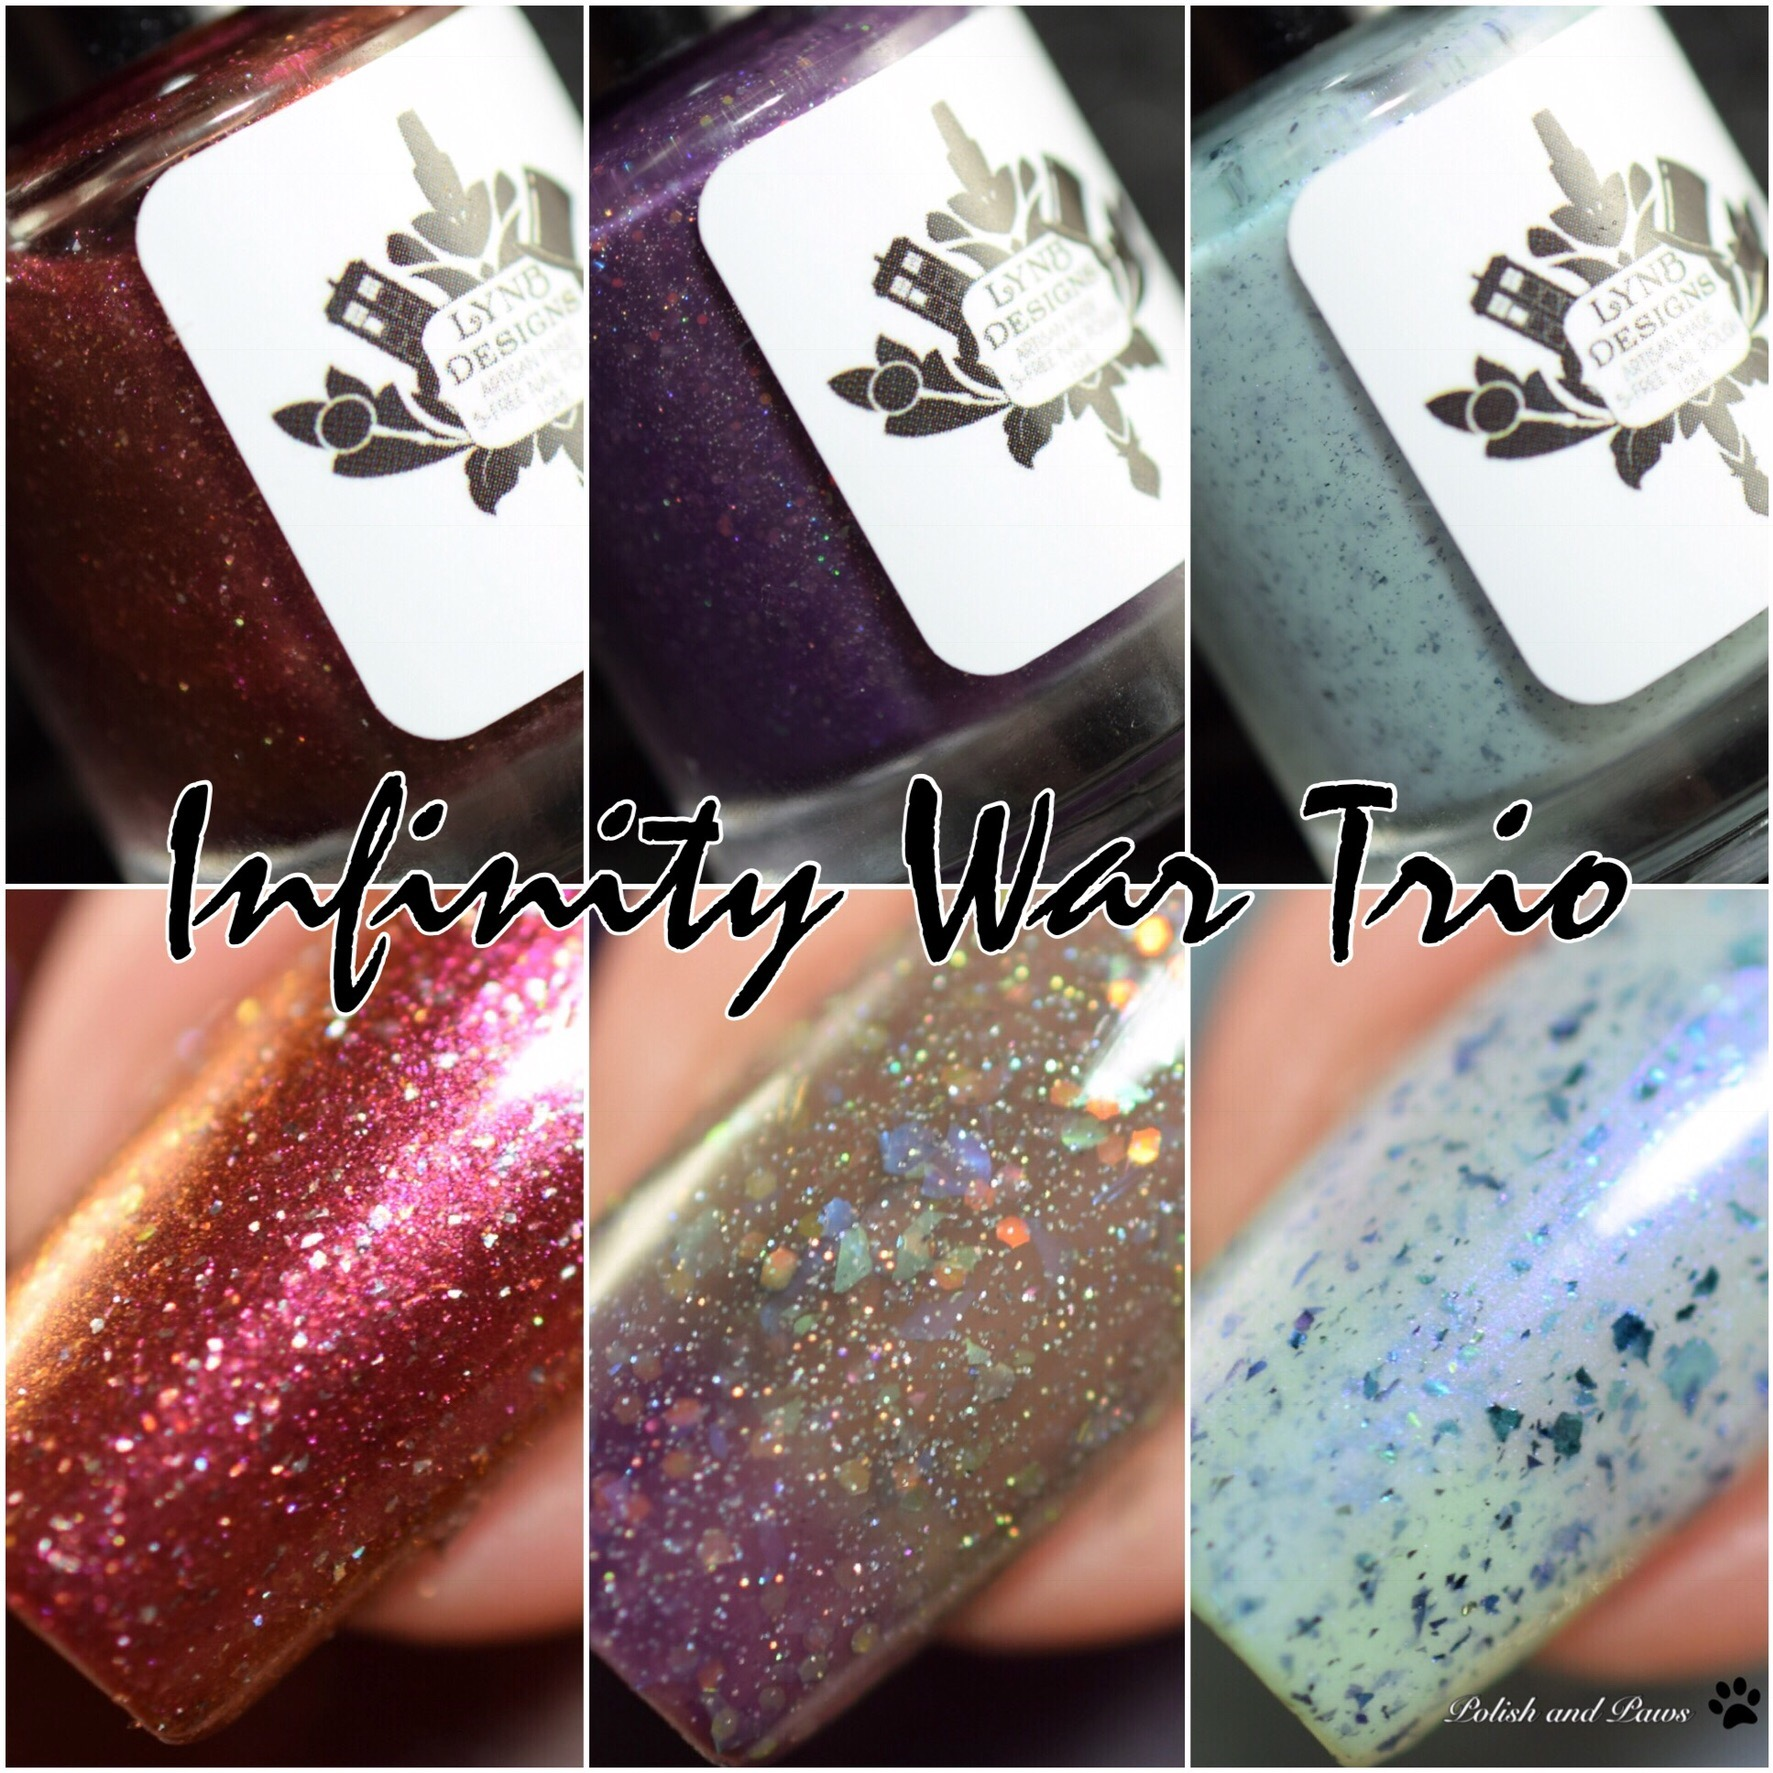 LynB Designs Infinity War Trio | Polish and Paws